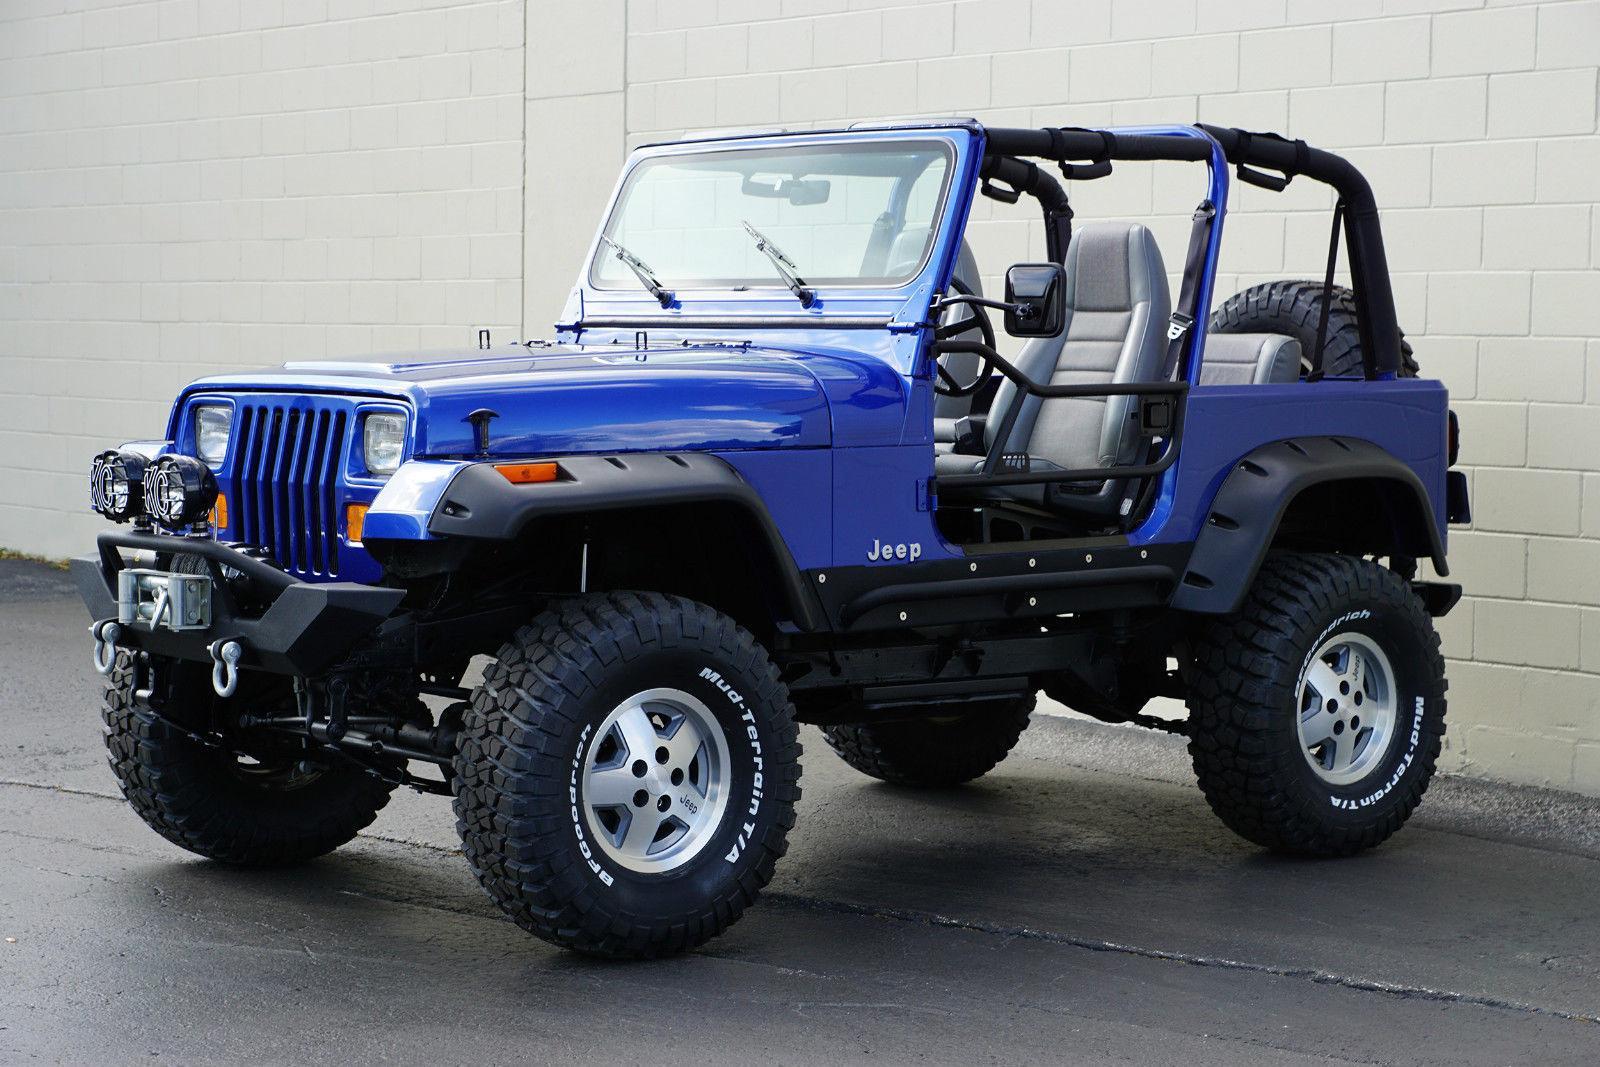 1995 jeep wrangler rio grande sport utility 2 door na prodej. Black Bedroom Furniture Sets. Home Design Ideas